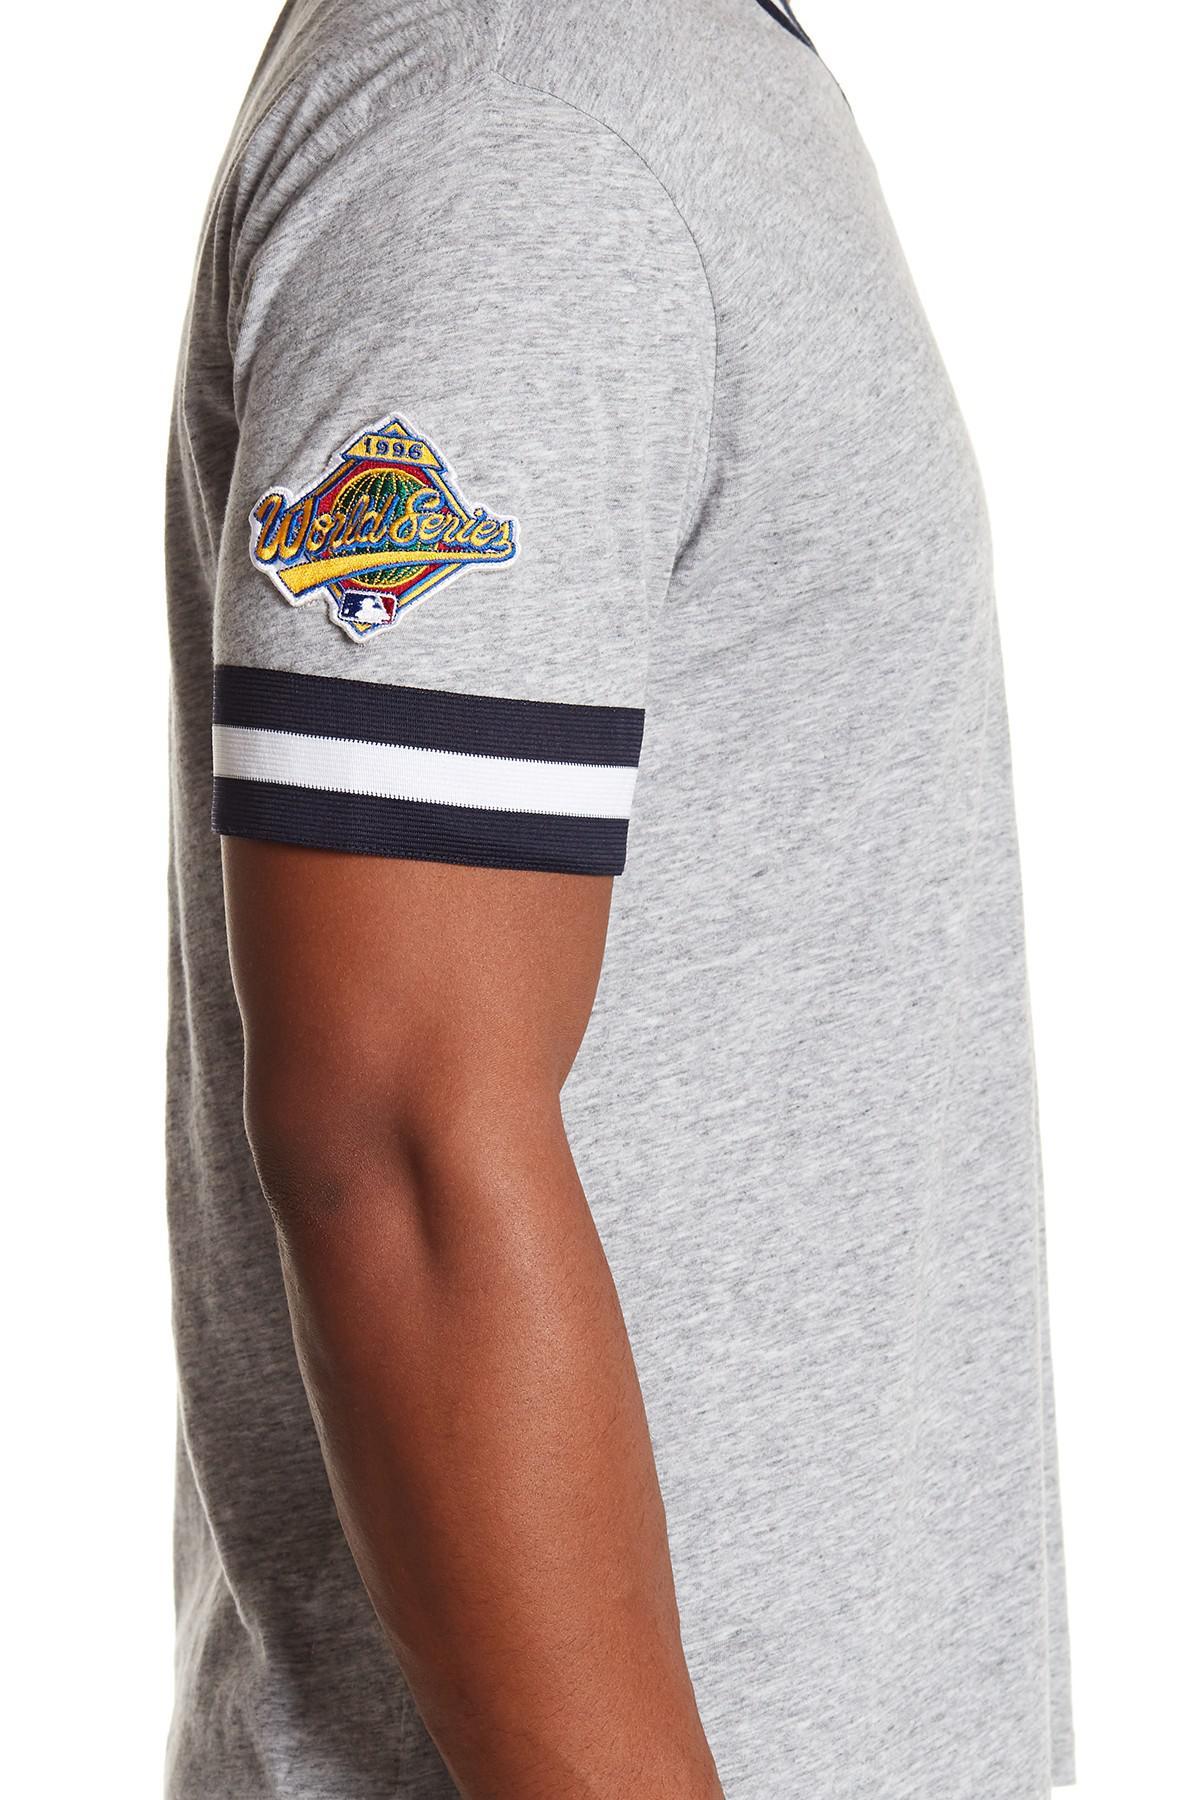 a70da638 Vintage Shirts Nyc | RLDM